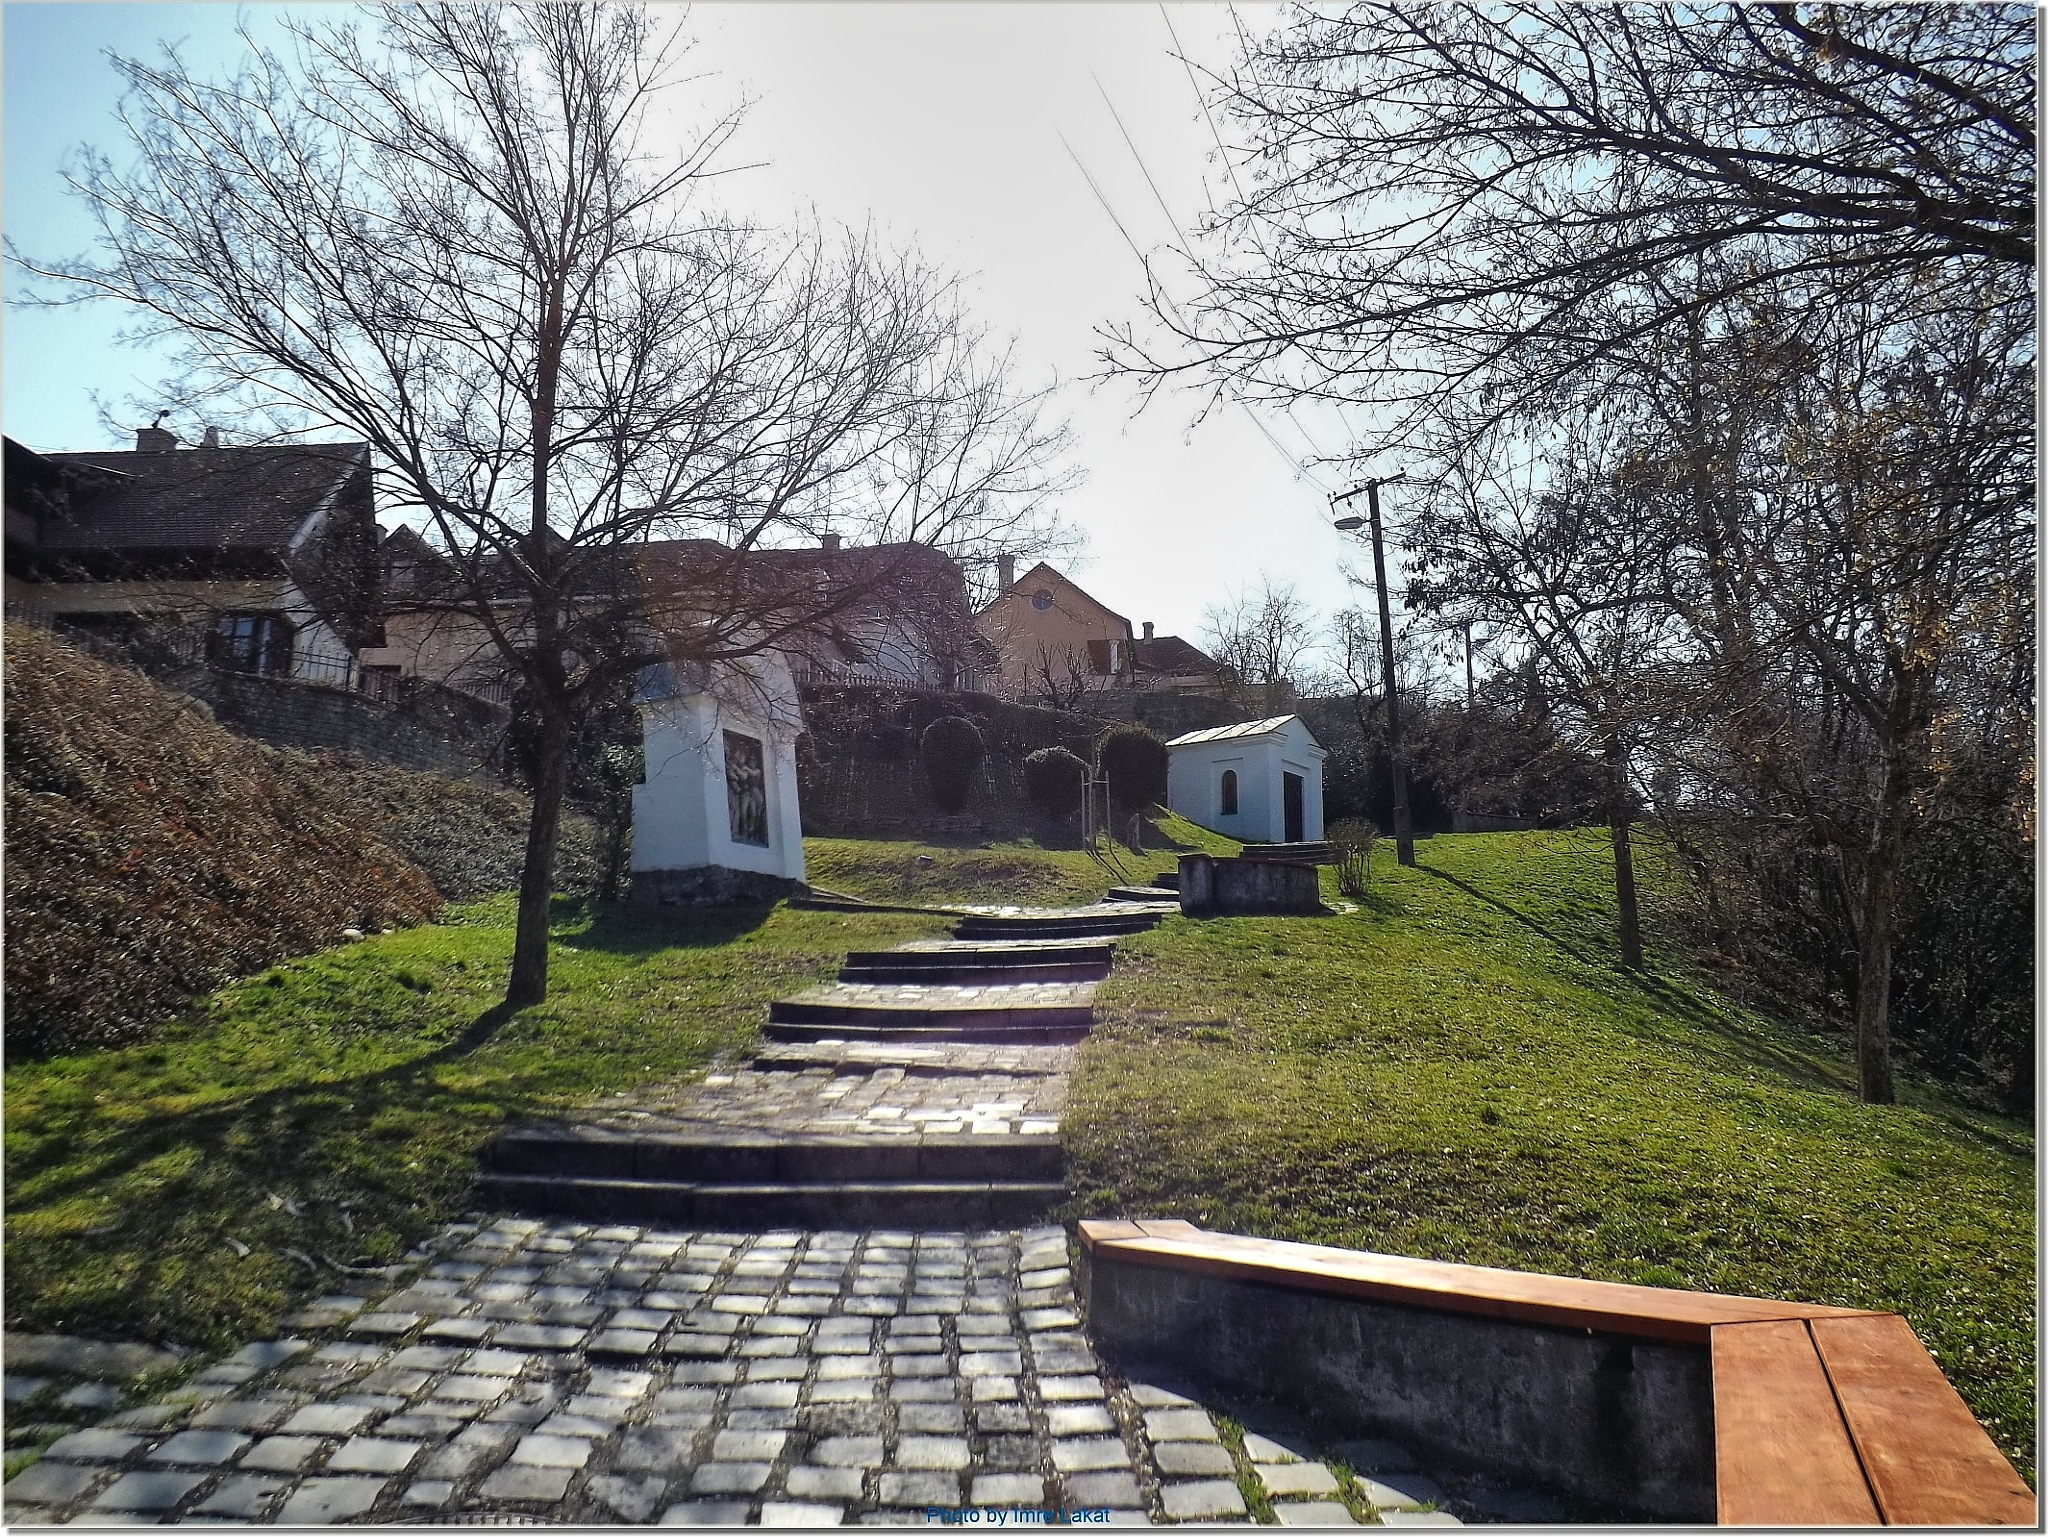 Calvary road in Esztergom city by Imre Lakat